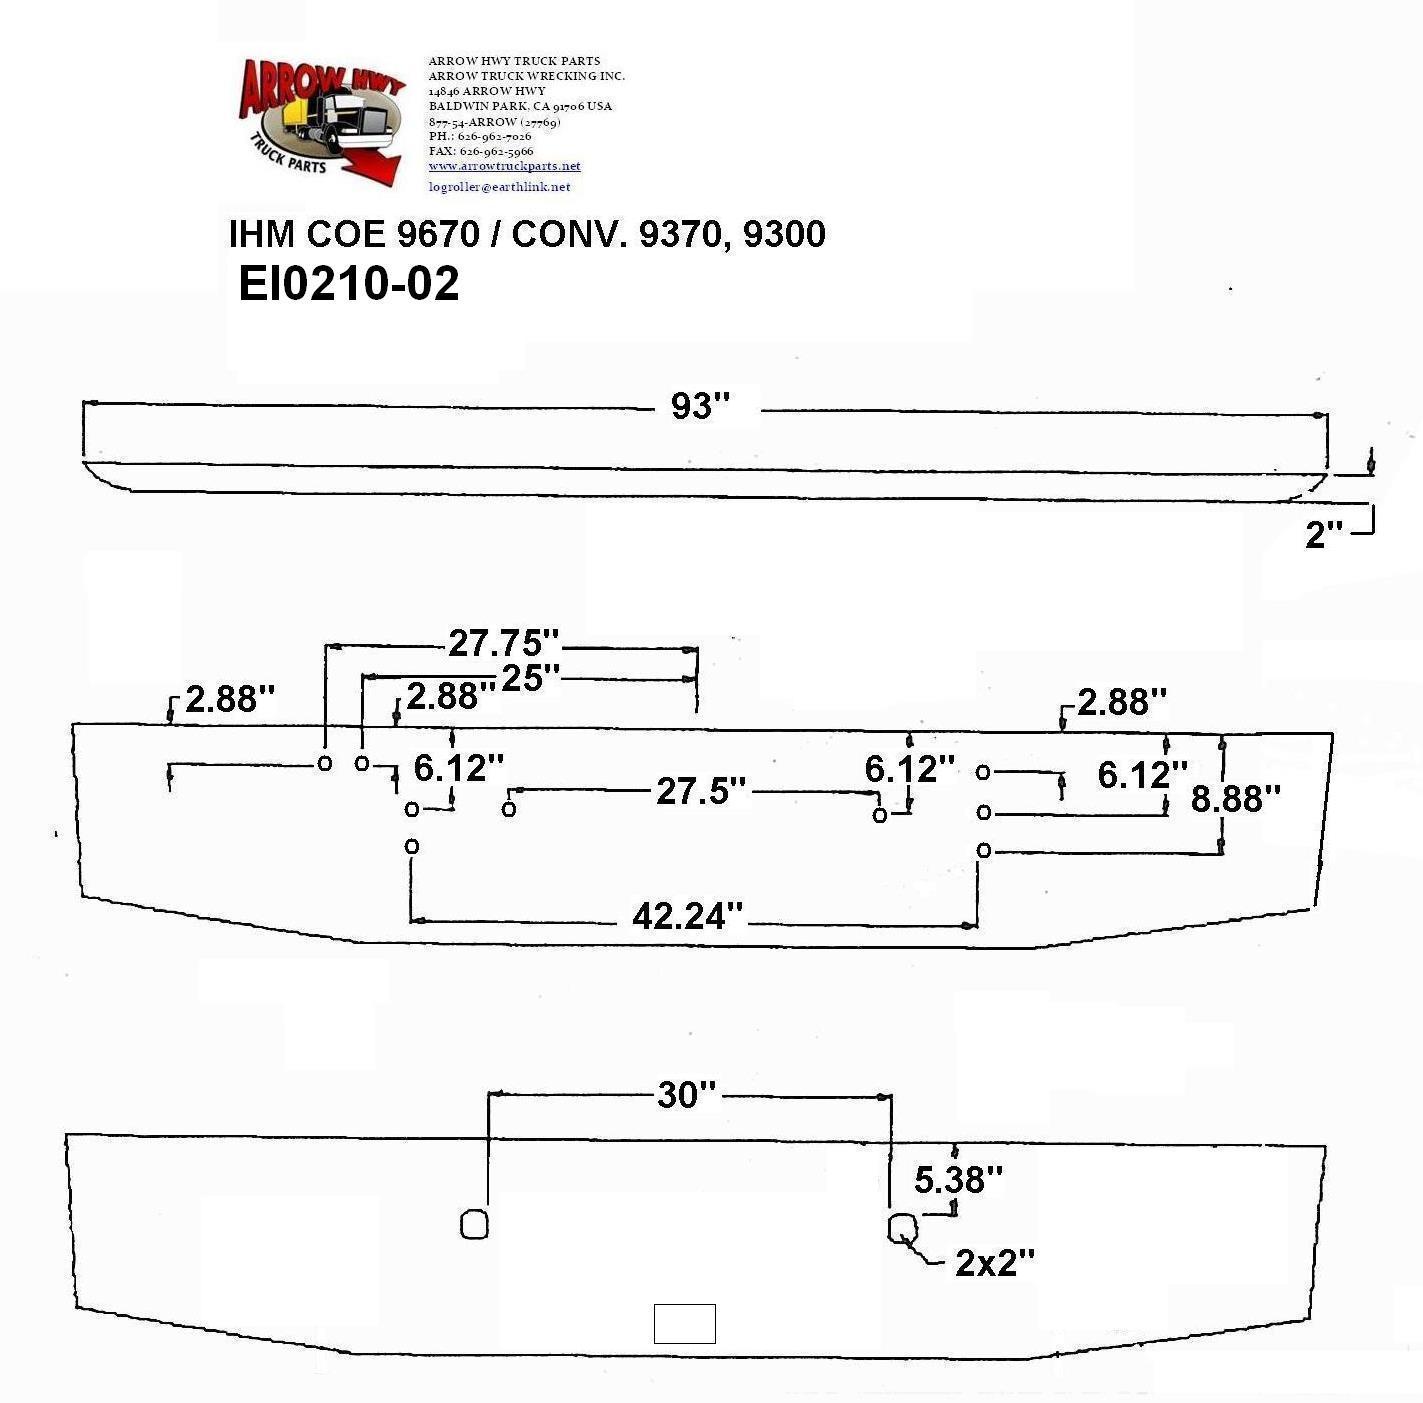 hight resolution of 1984 international s1900 truck wiring diagram wiring diagrams 2600 international at international 2574 wiring diagram